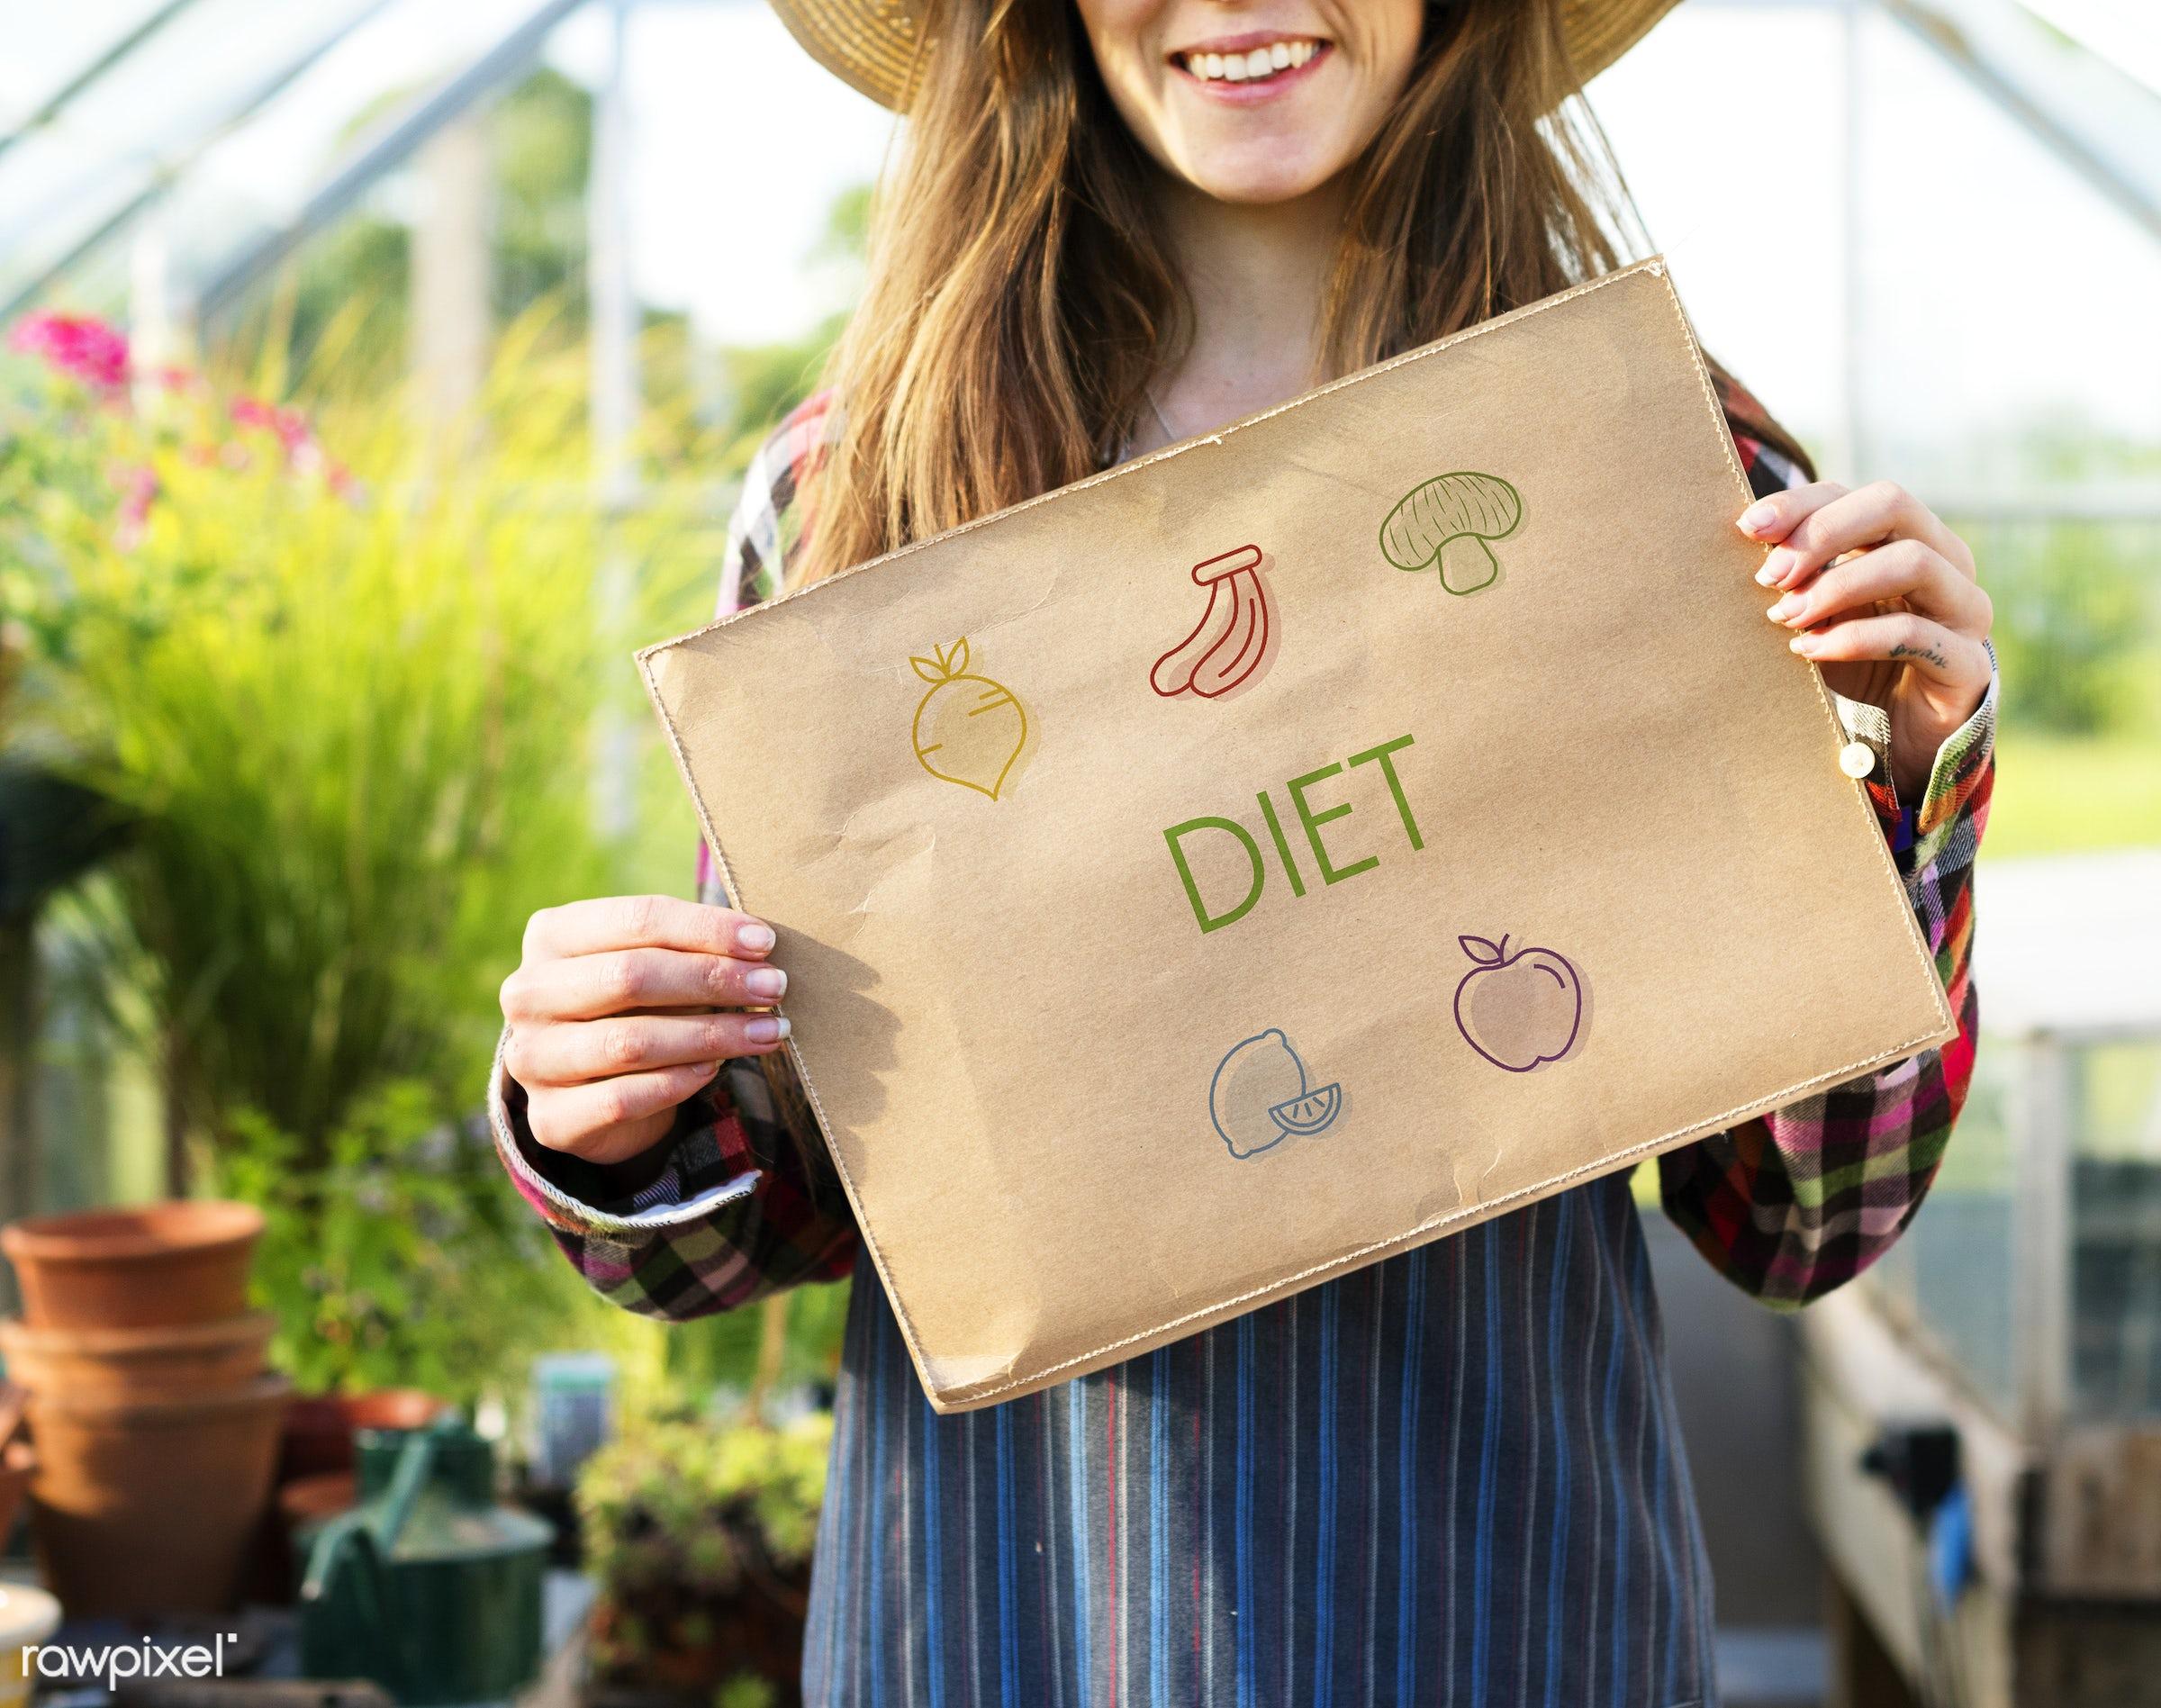 adult, antioxidants, balance, caucasian, countryside, dark blonde, diet, diversity, eating, farm, female, flowers, food,...